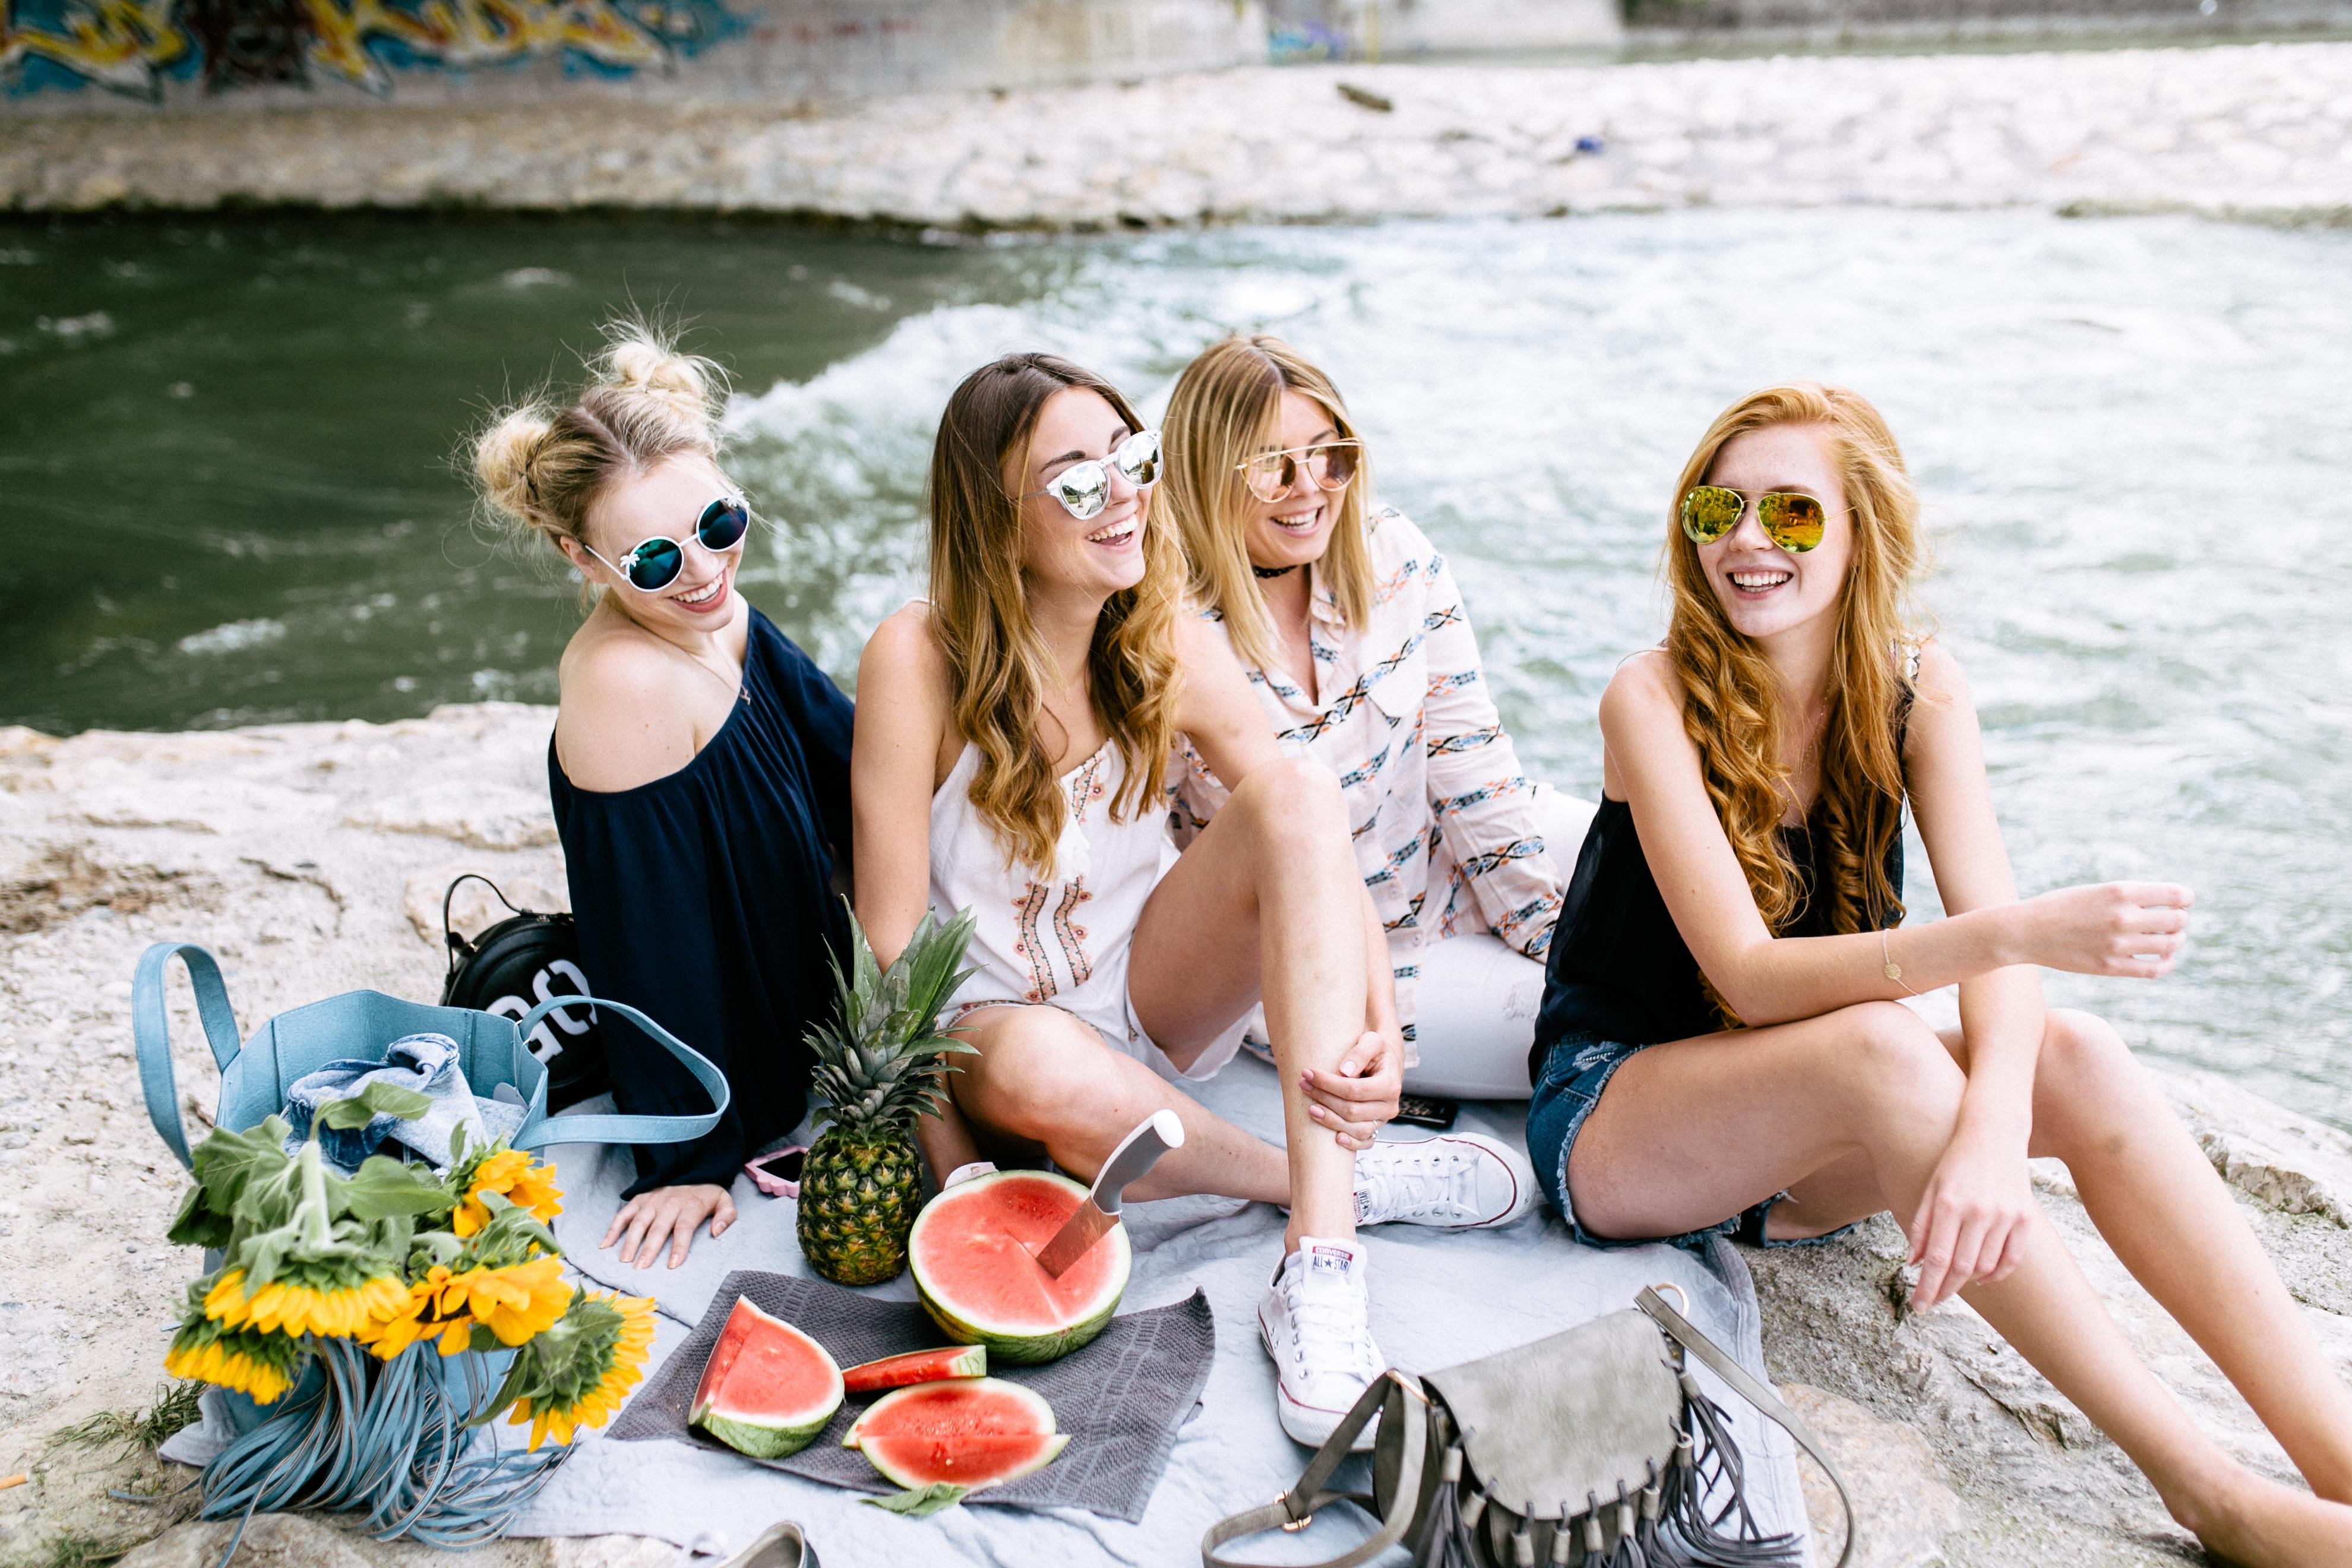 Franziska Elea deutsche Blogger Squad Mädels Picknick Wassermelone Ananas Sommer Outfits ootd Girls Freundinnen